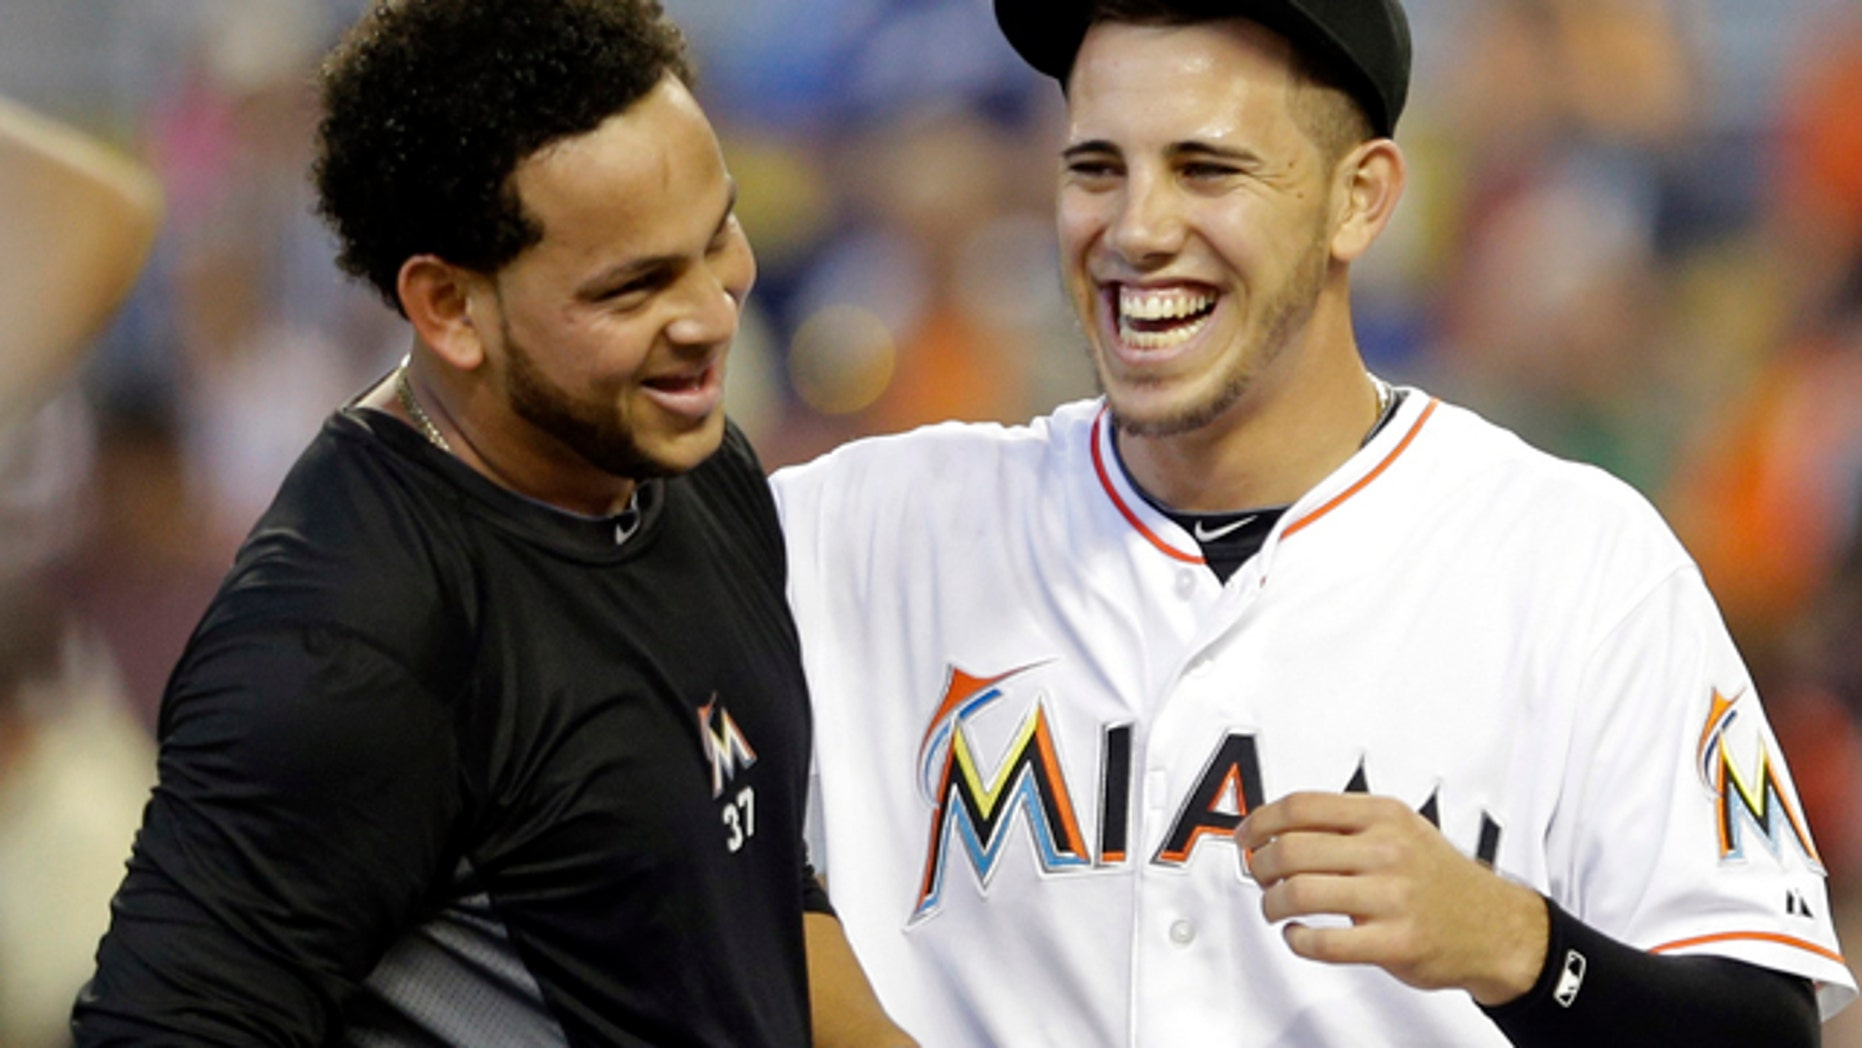 Sept. 29, 2013: Miami Marlins starting pitcher Henderson Alvarez, left, and Jose Fernandez, right, celebrate Alvarez's no-hitter against the Detroit Tigers.